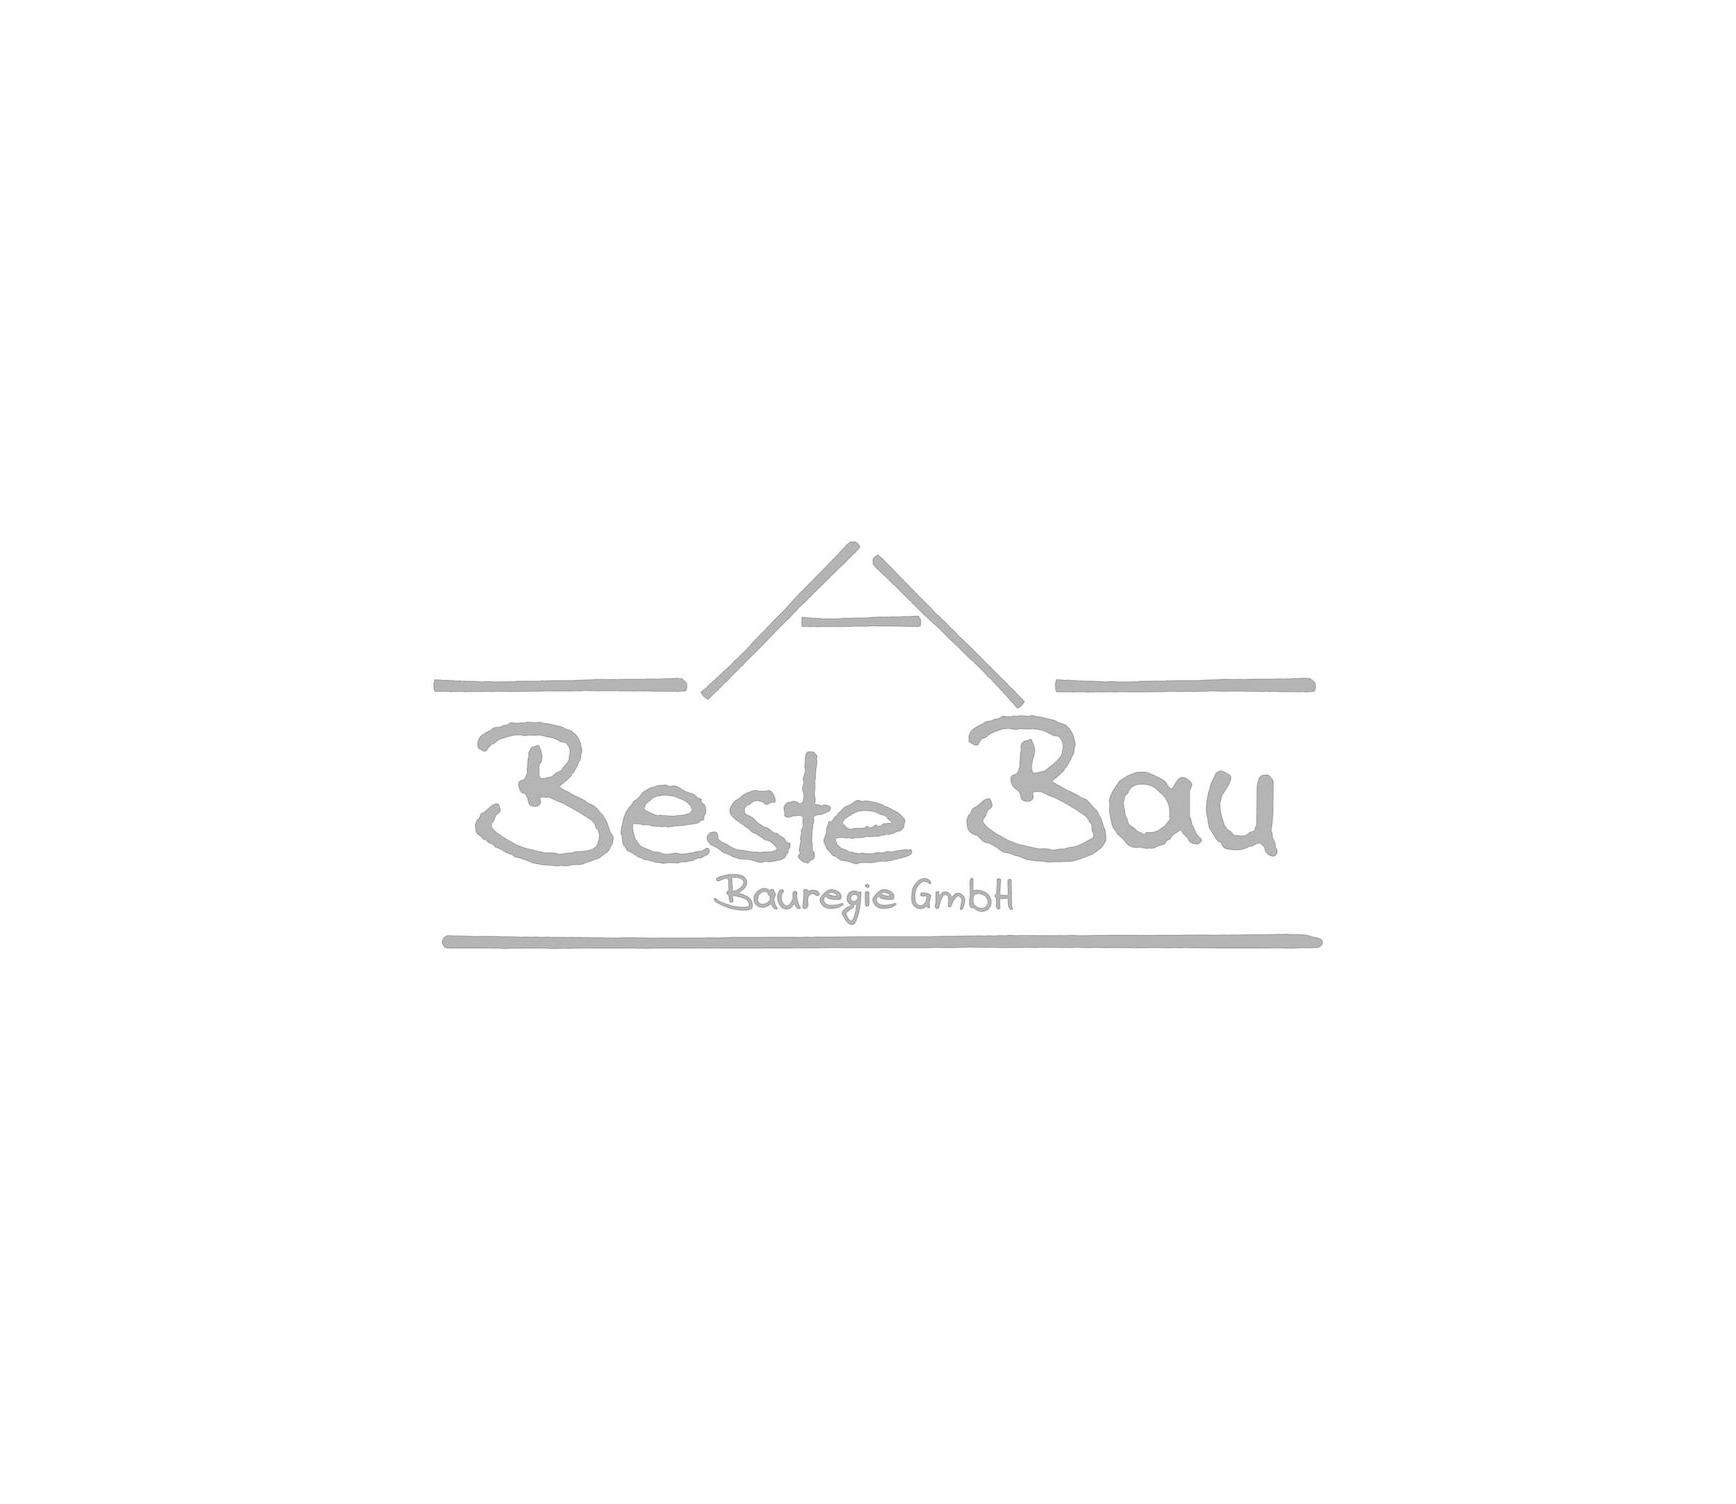 Beste-Bau-Bauregie-Logo-freigestellt-1_e